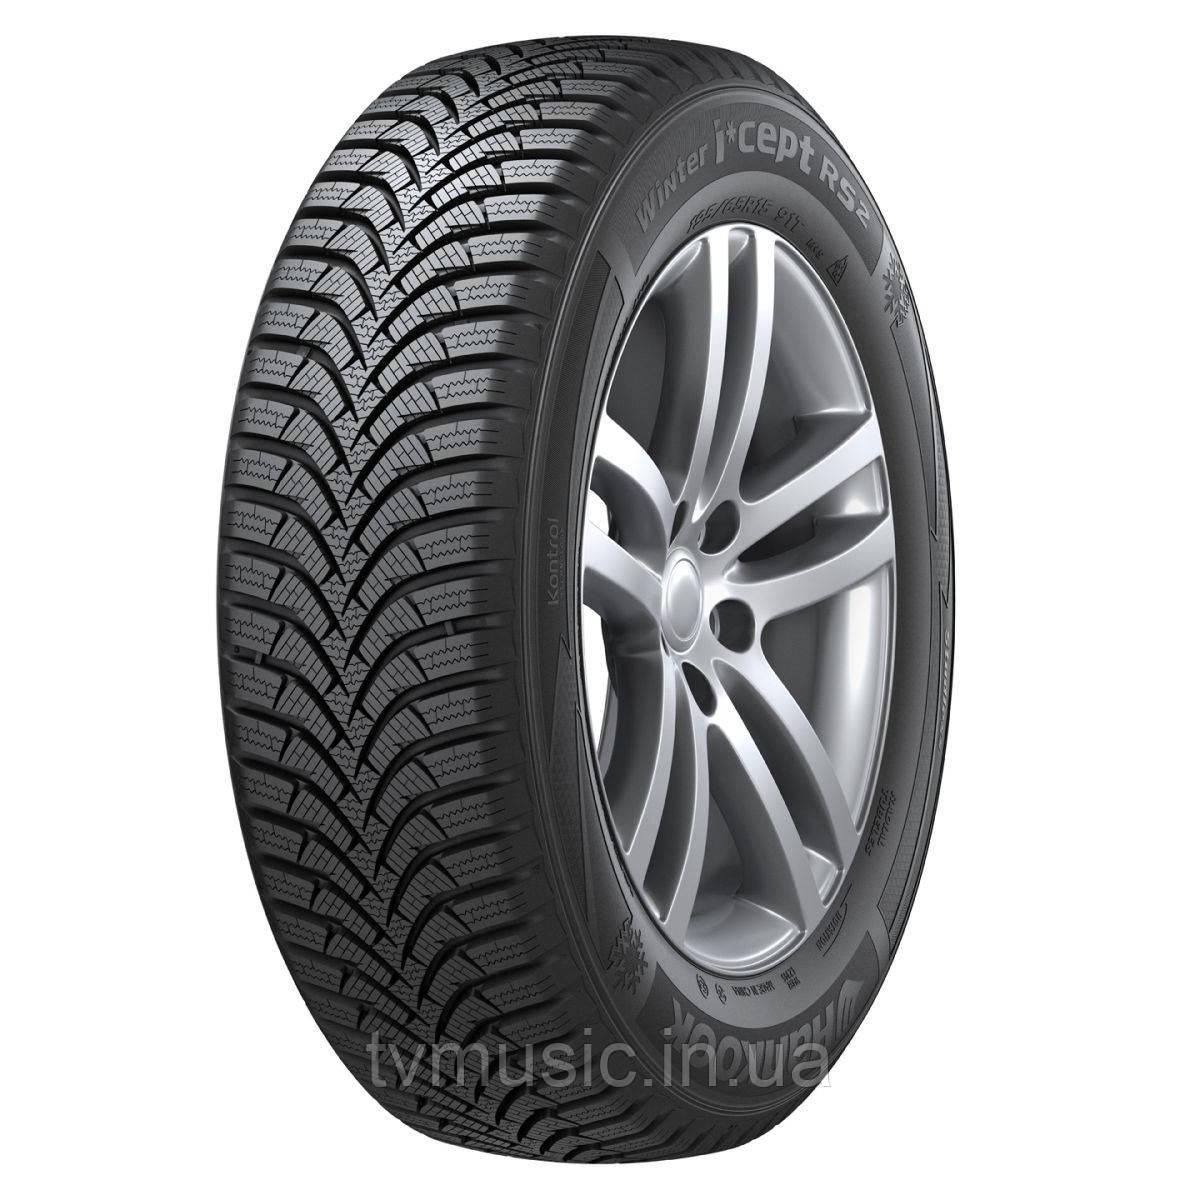 Зимняя шина Hankook Winter I*Cept RS2 W452 (195/65 R15 91T)